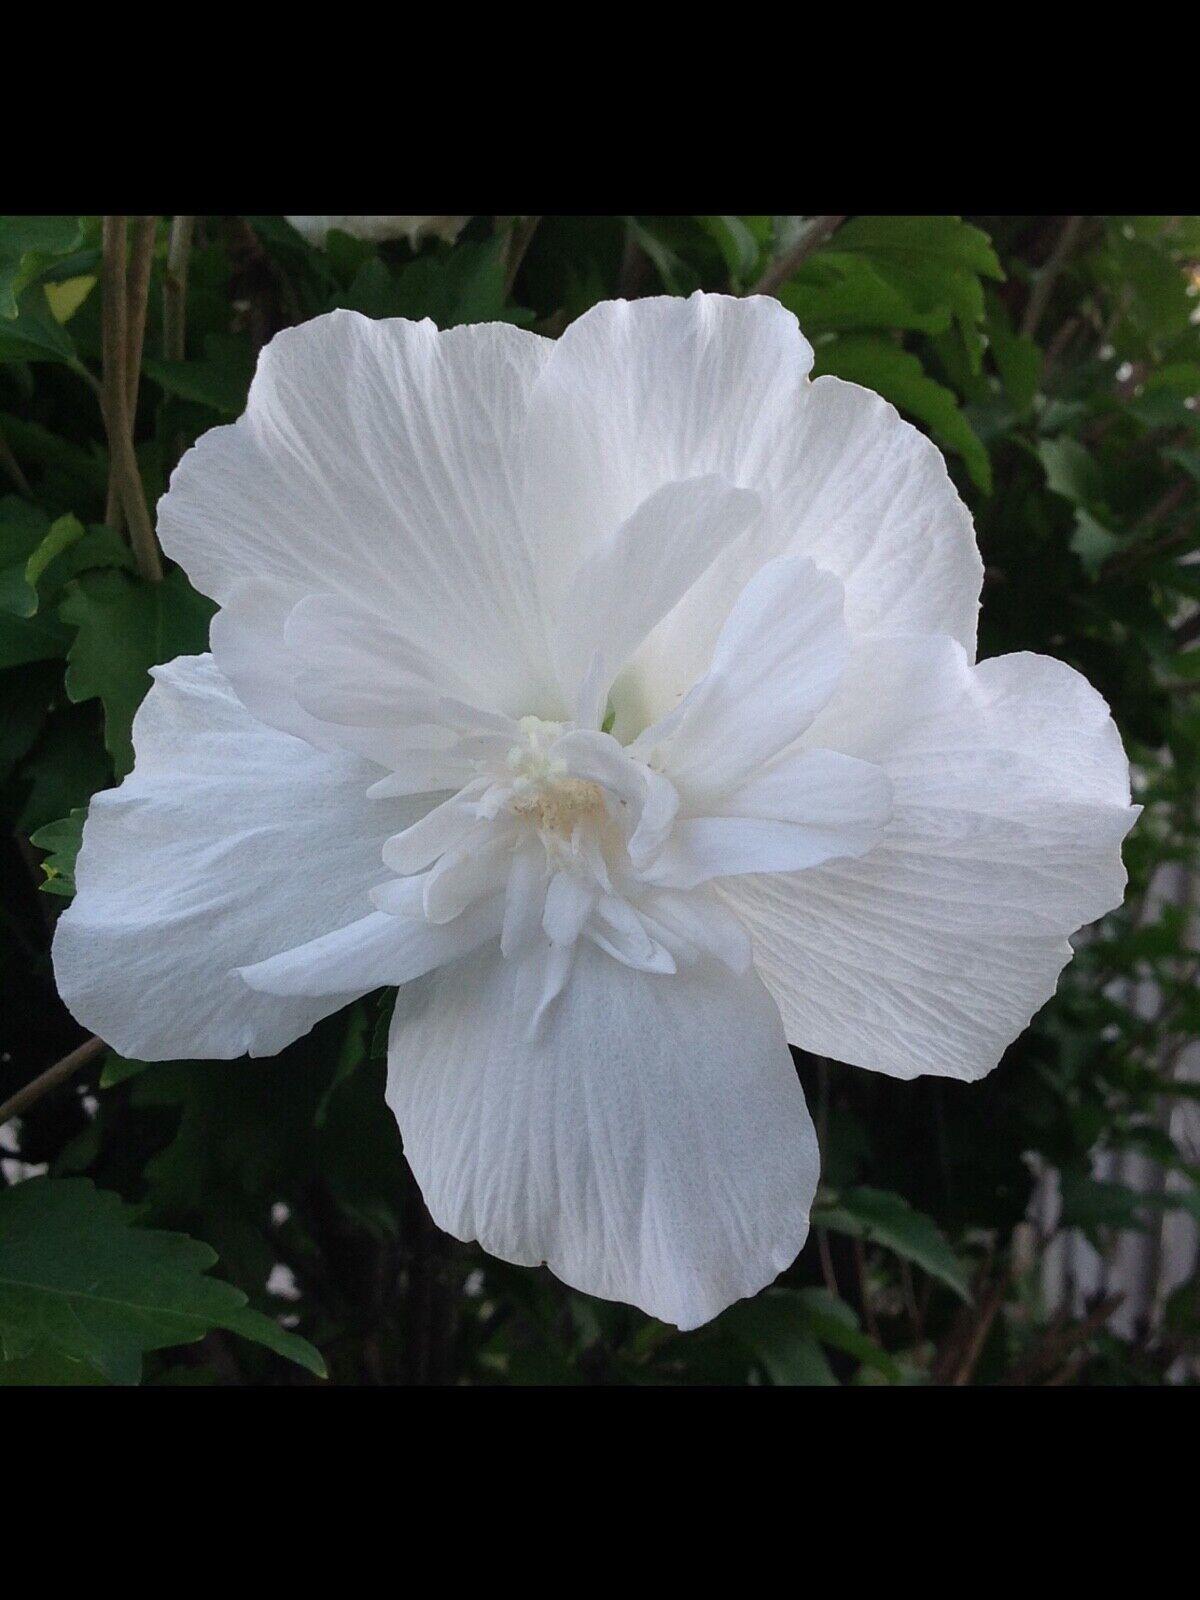 'White Chiffon' Rose of Sharon Perennial dbl flower, tall shrub seeds *butterfly